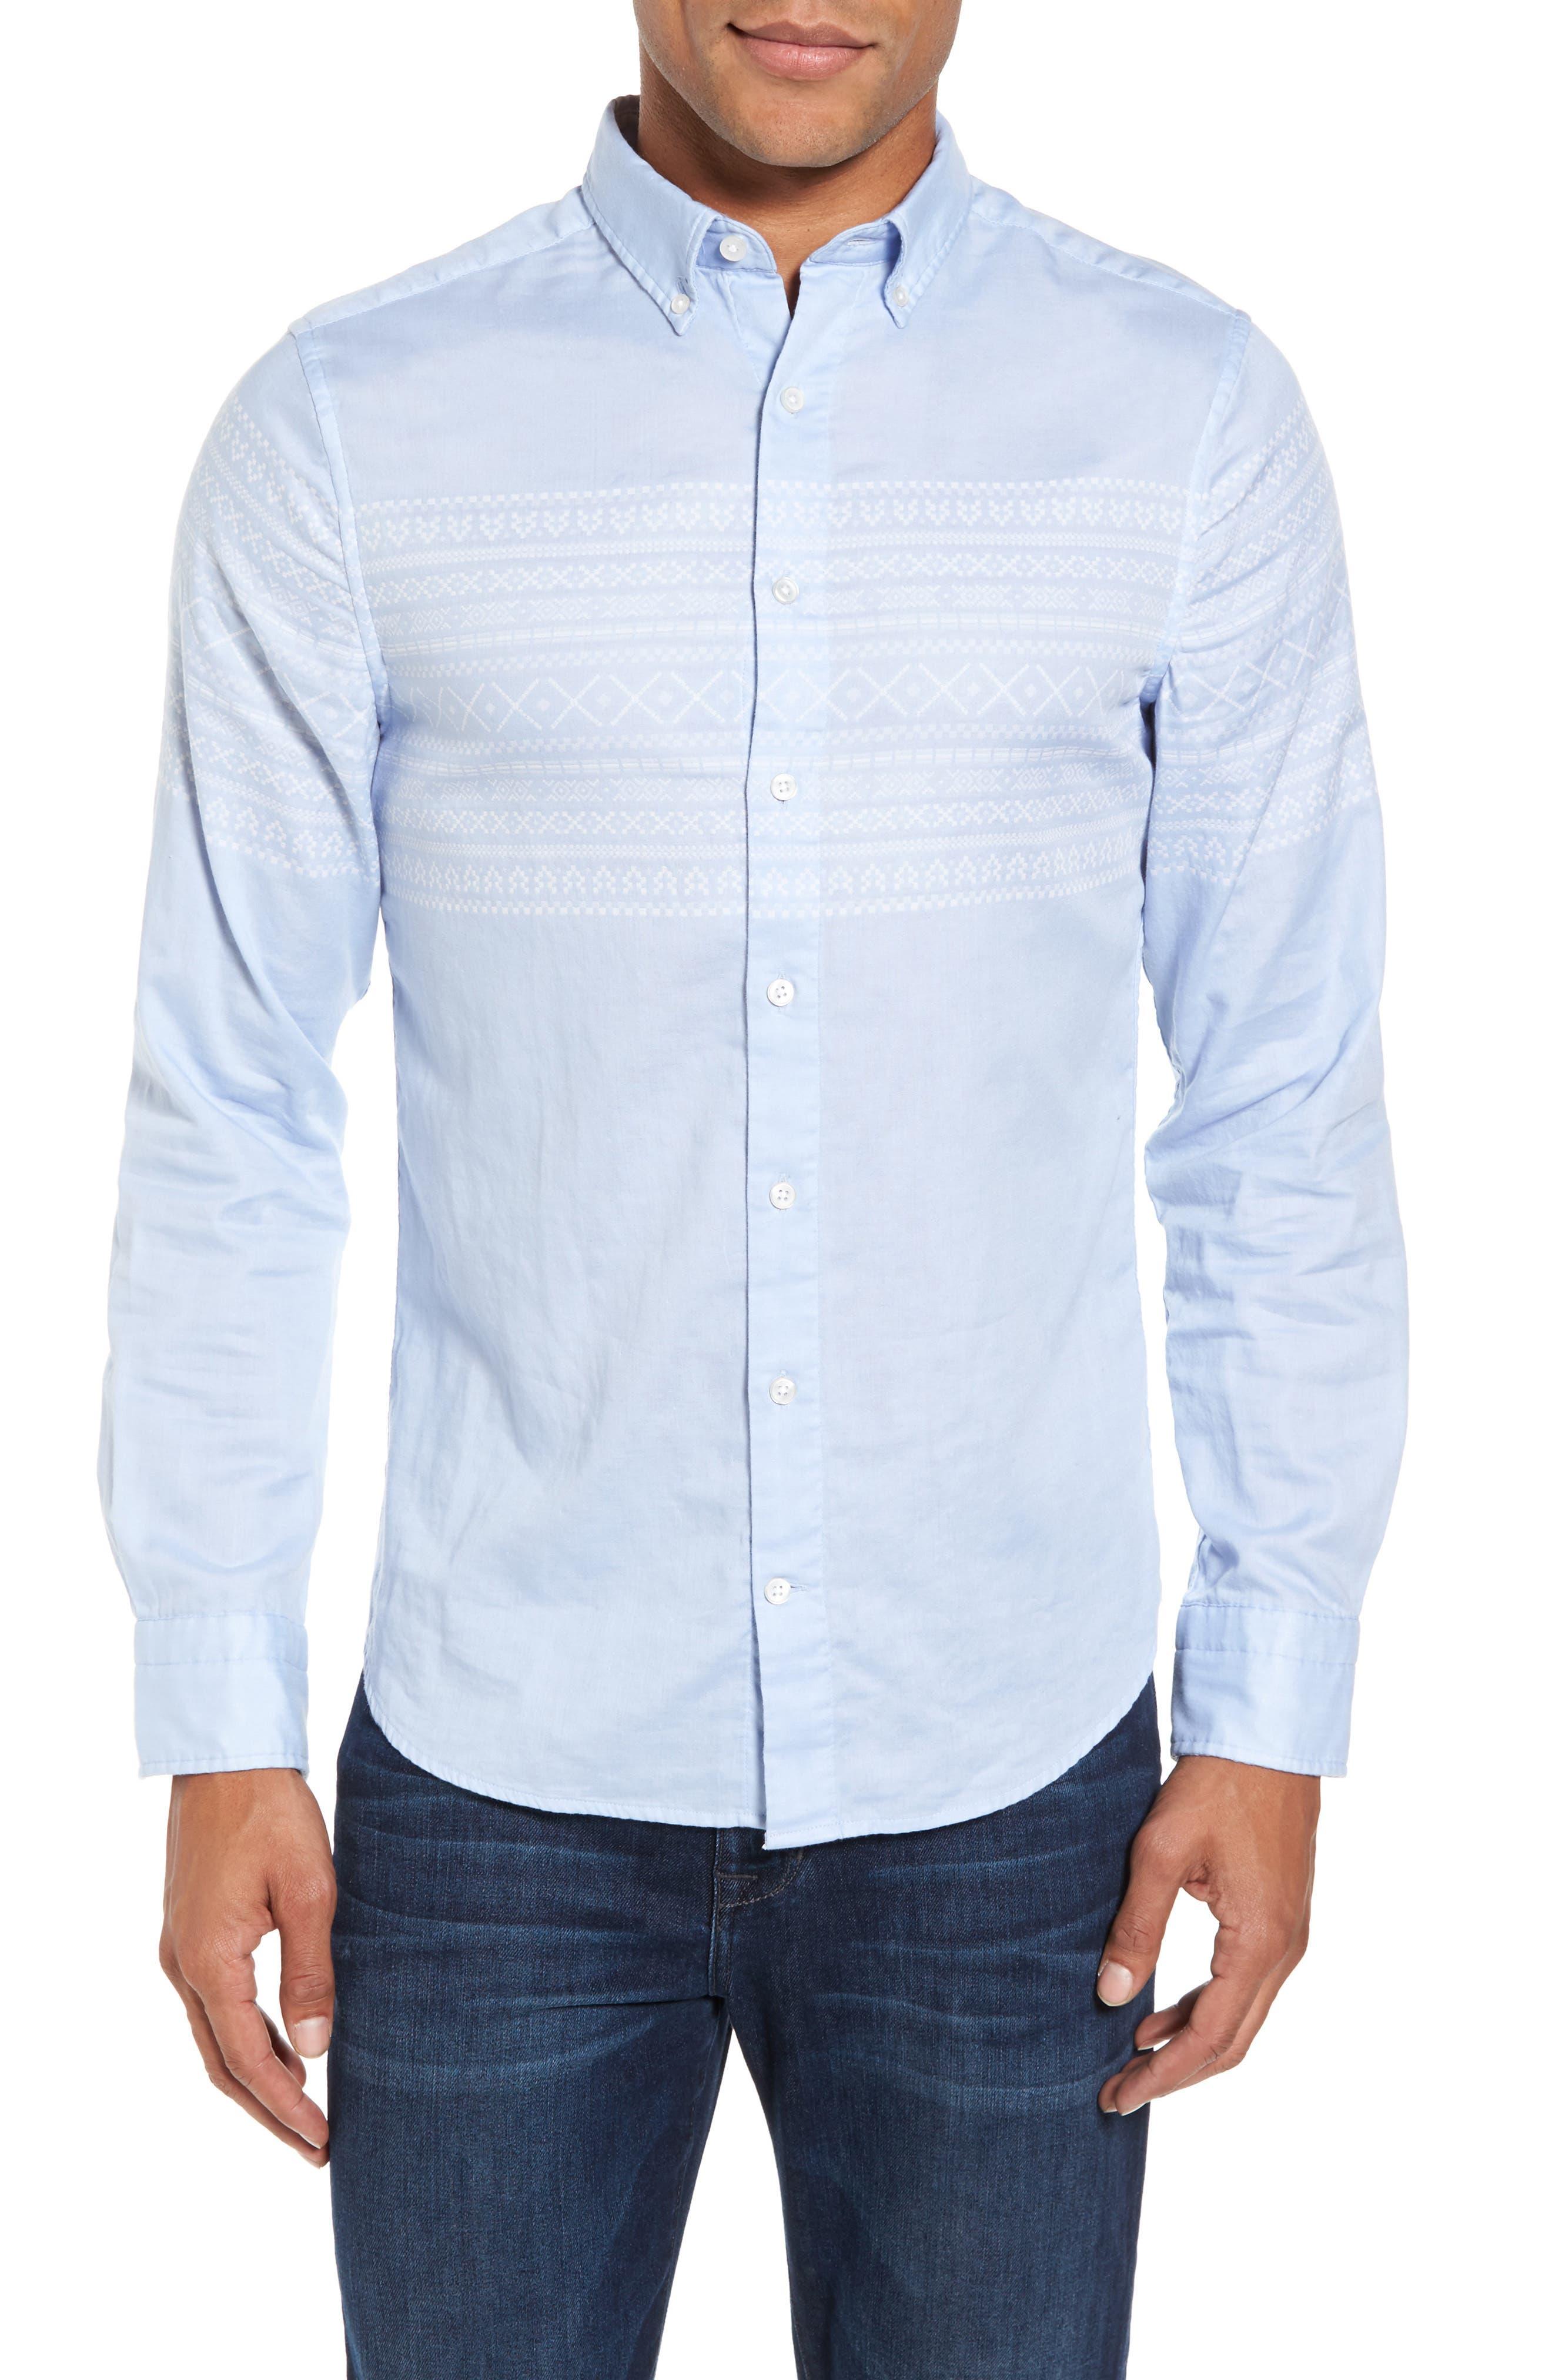 02 Extra Slim Fit Fair Isle Print Sport Shirt,                             Main thumbnail 1, color,                             420